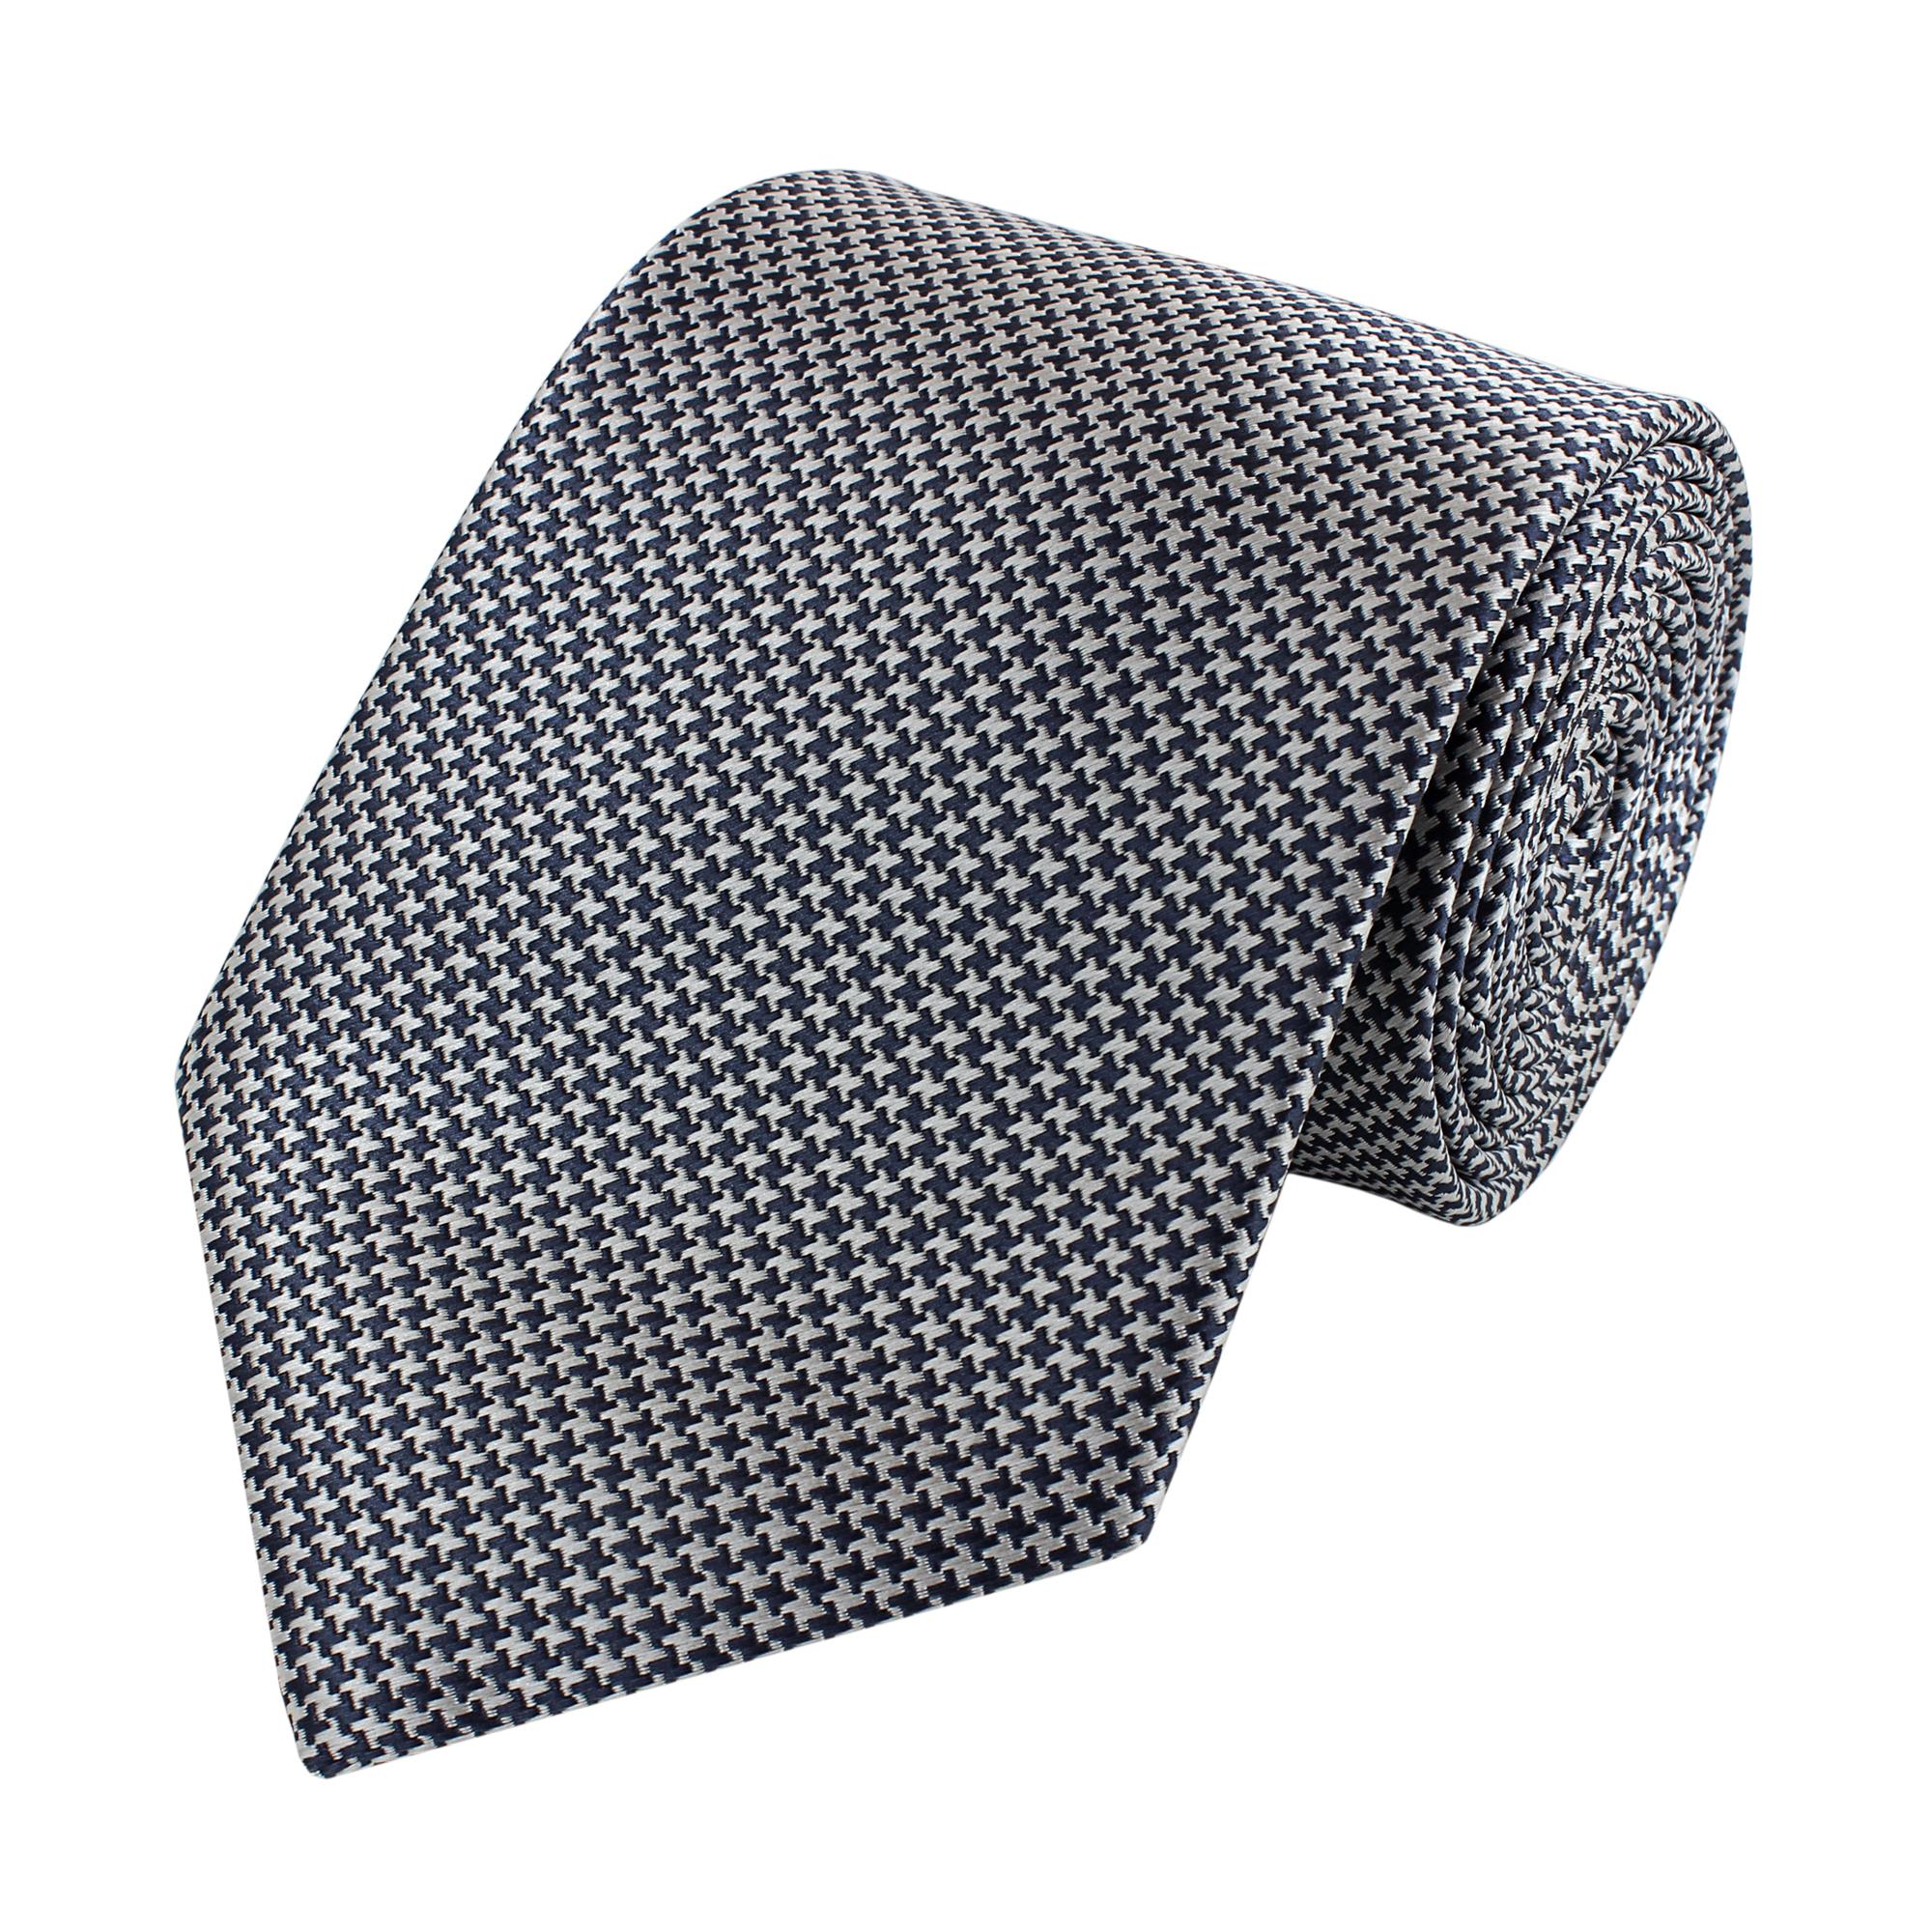 Edle schwarze Designer Krawatte 8cm Fabio Farini gestreift in silbergrau /& weiß